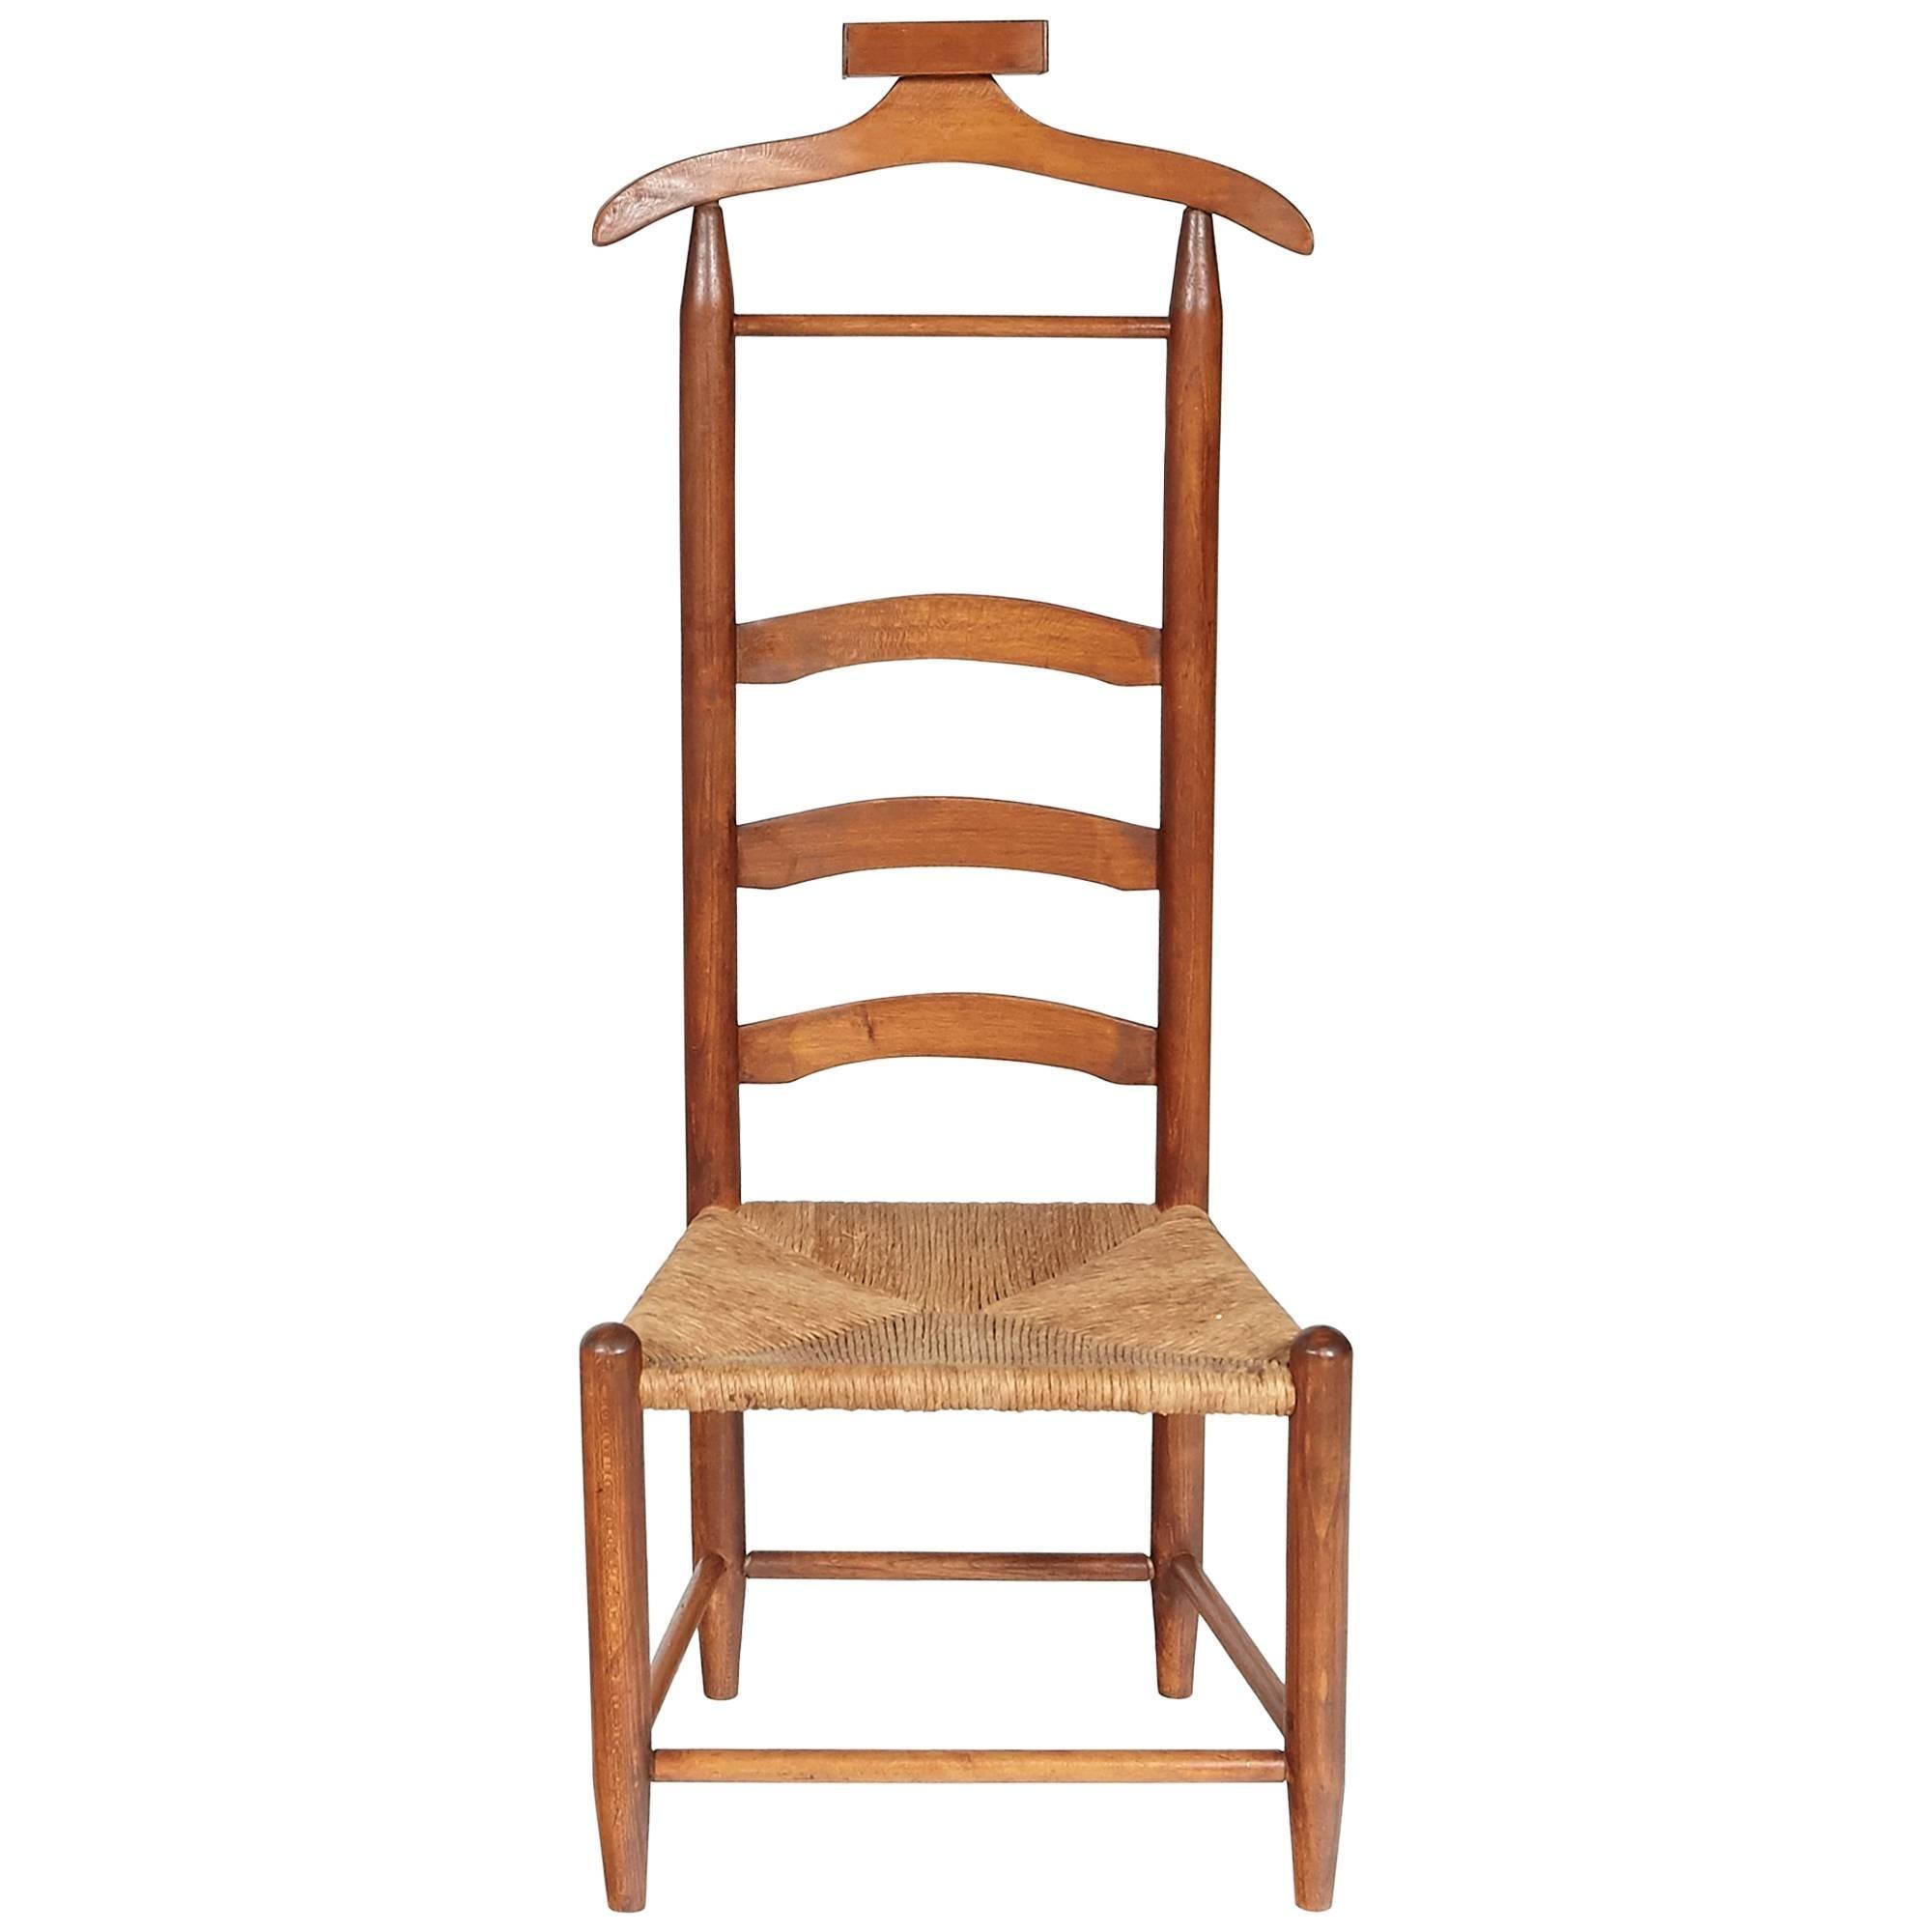 Merveilleux Menu0027s Rush Seat Bedroom Valet For Sale